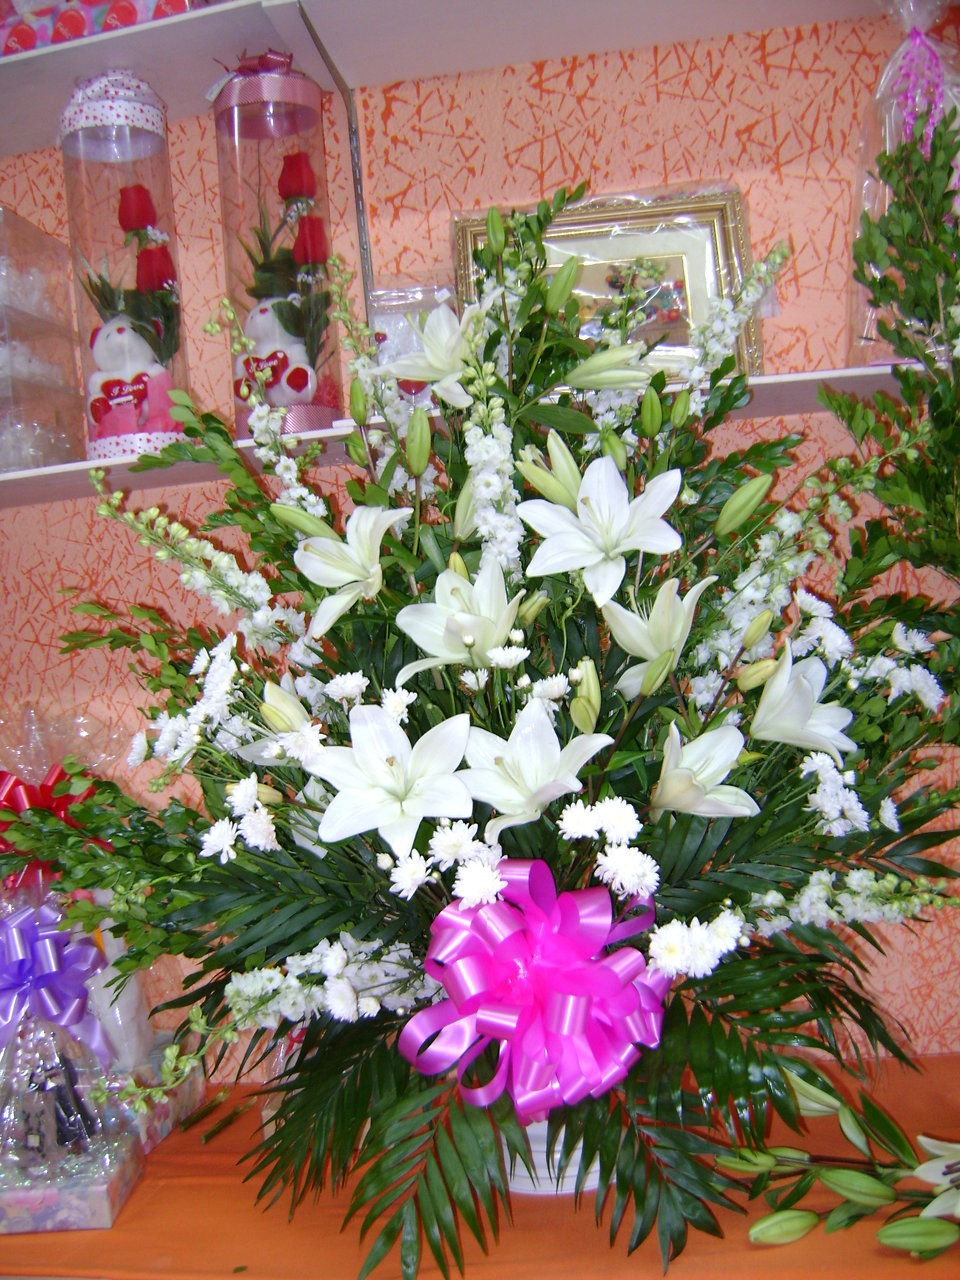 Floreria Del Arte Flores y Regalos  Wixcom